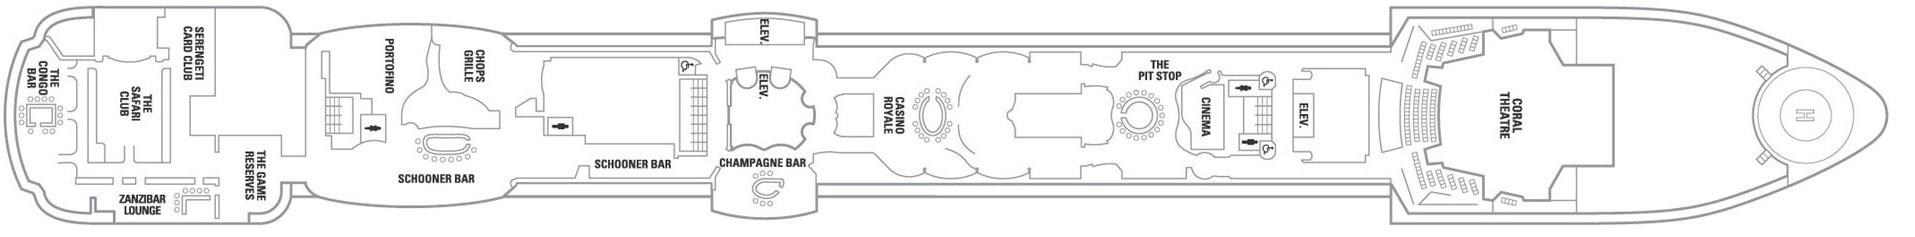 Royal Caribbean- Jewel of the Seas Deck  6.jpg